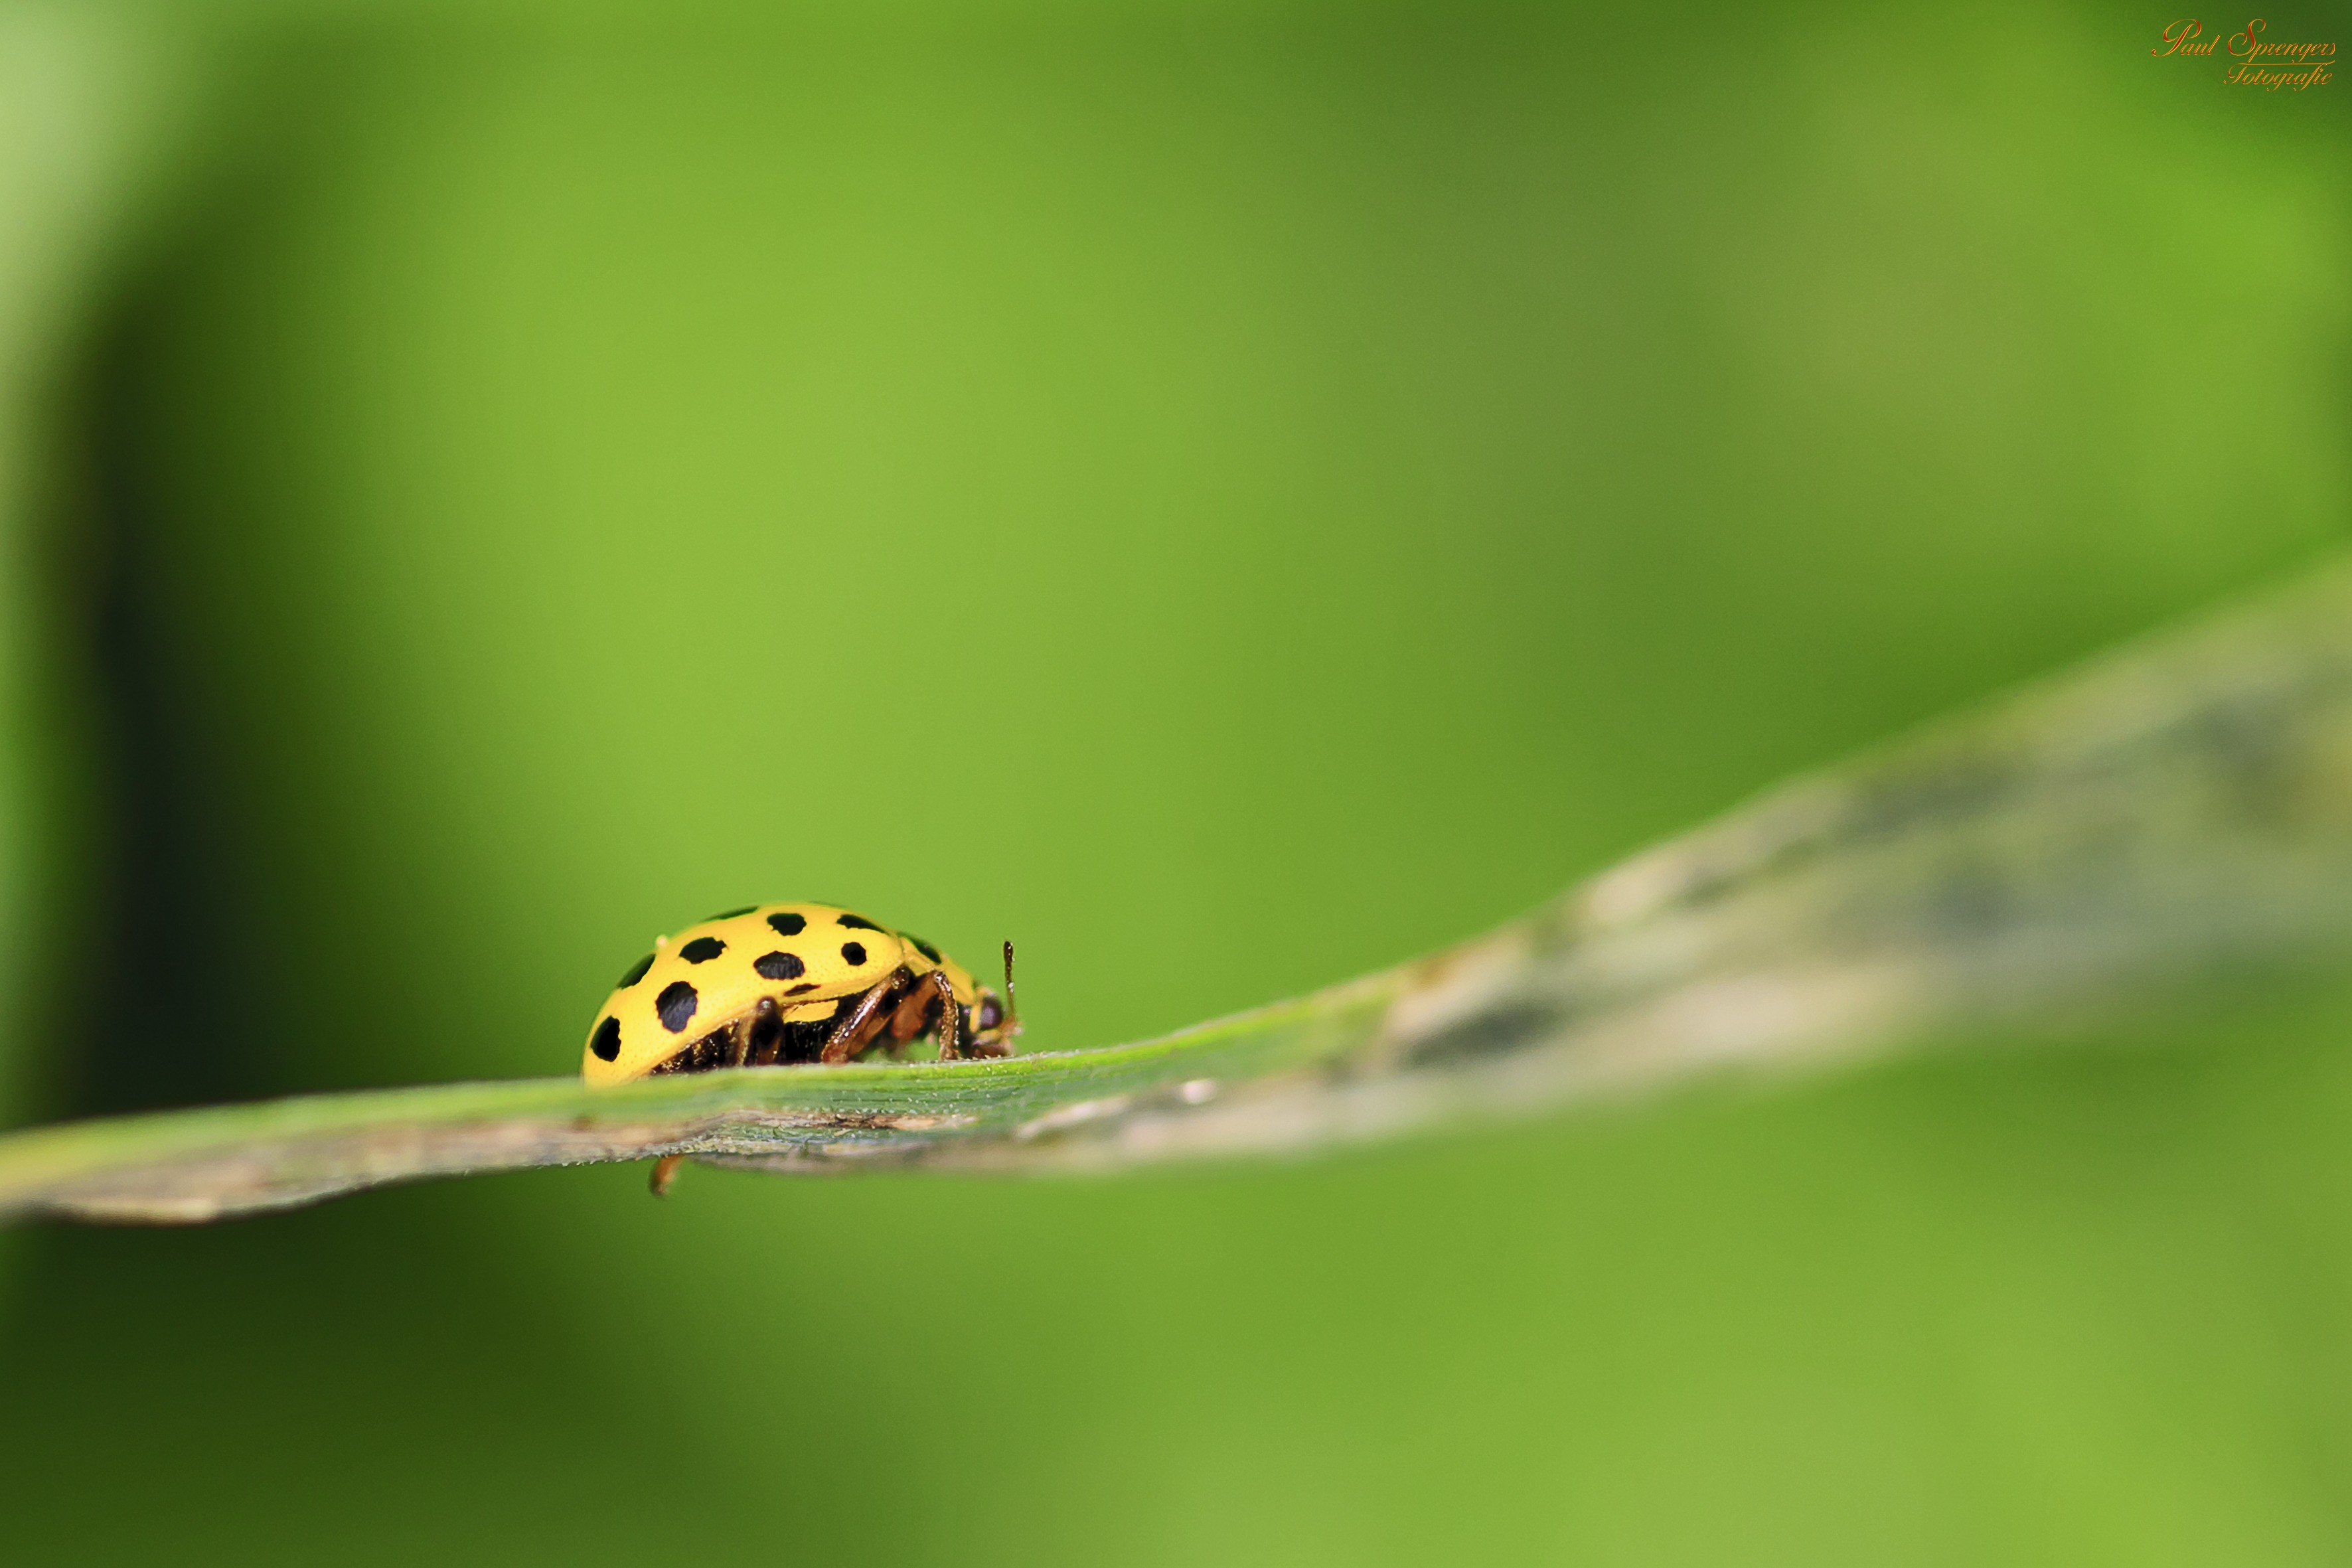 green lady bug on plant leaf free stock photo